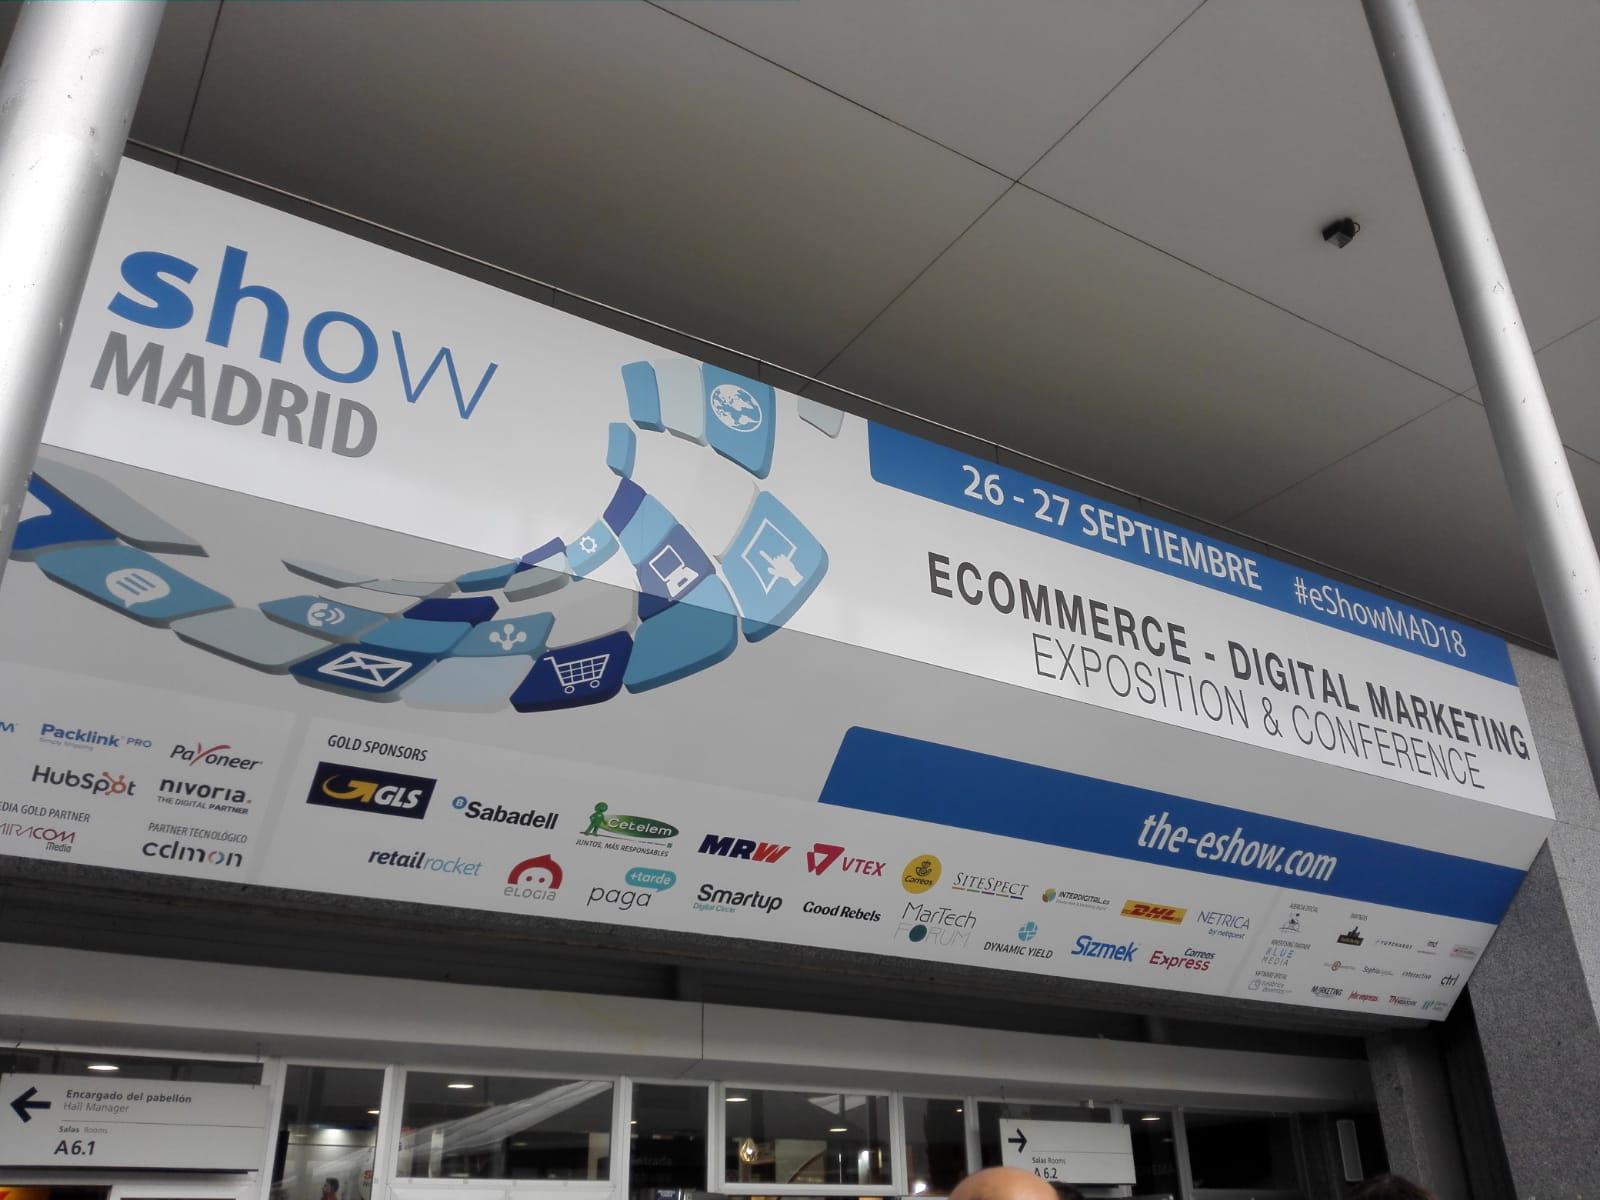 Intensas Networks Eshow Madrid 2018 a inteligencia artificial tambien en Ecommerce